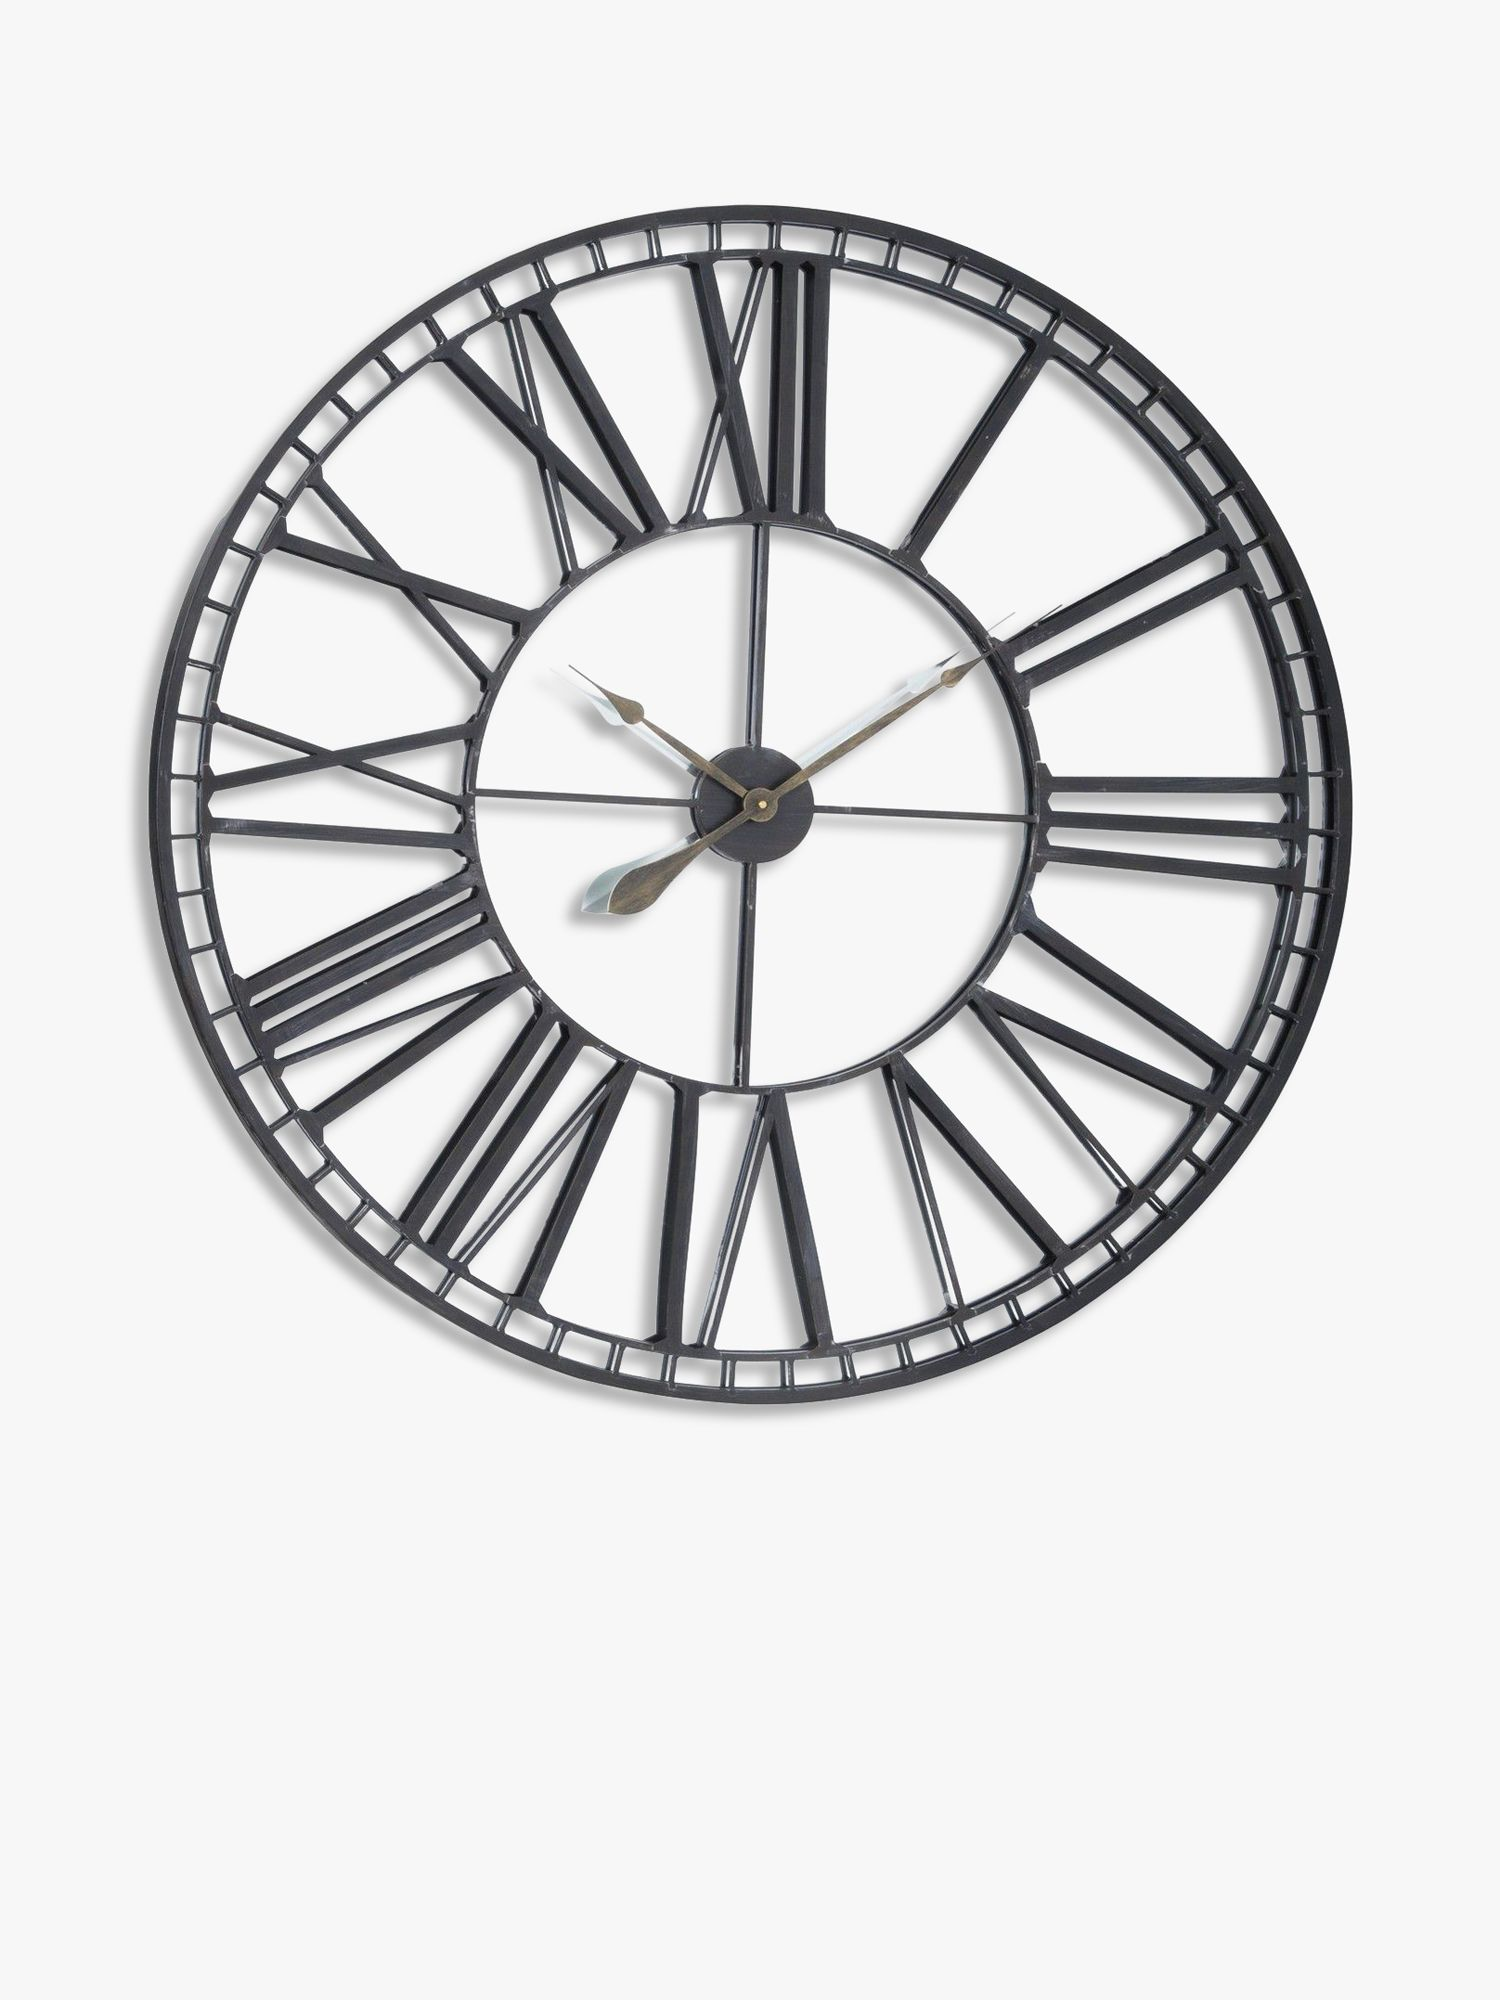 Libra Skeleton Roman Numerals Large Round Mirror Wall Clock, 100cm, Black